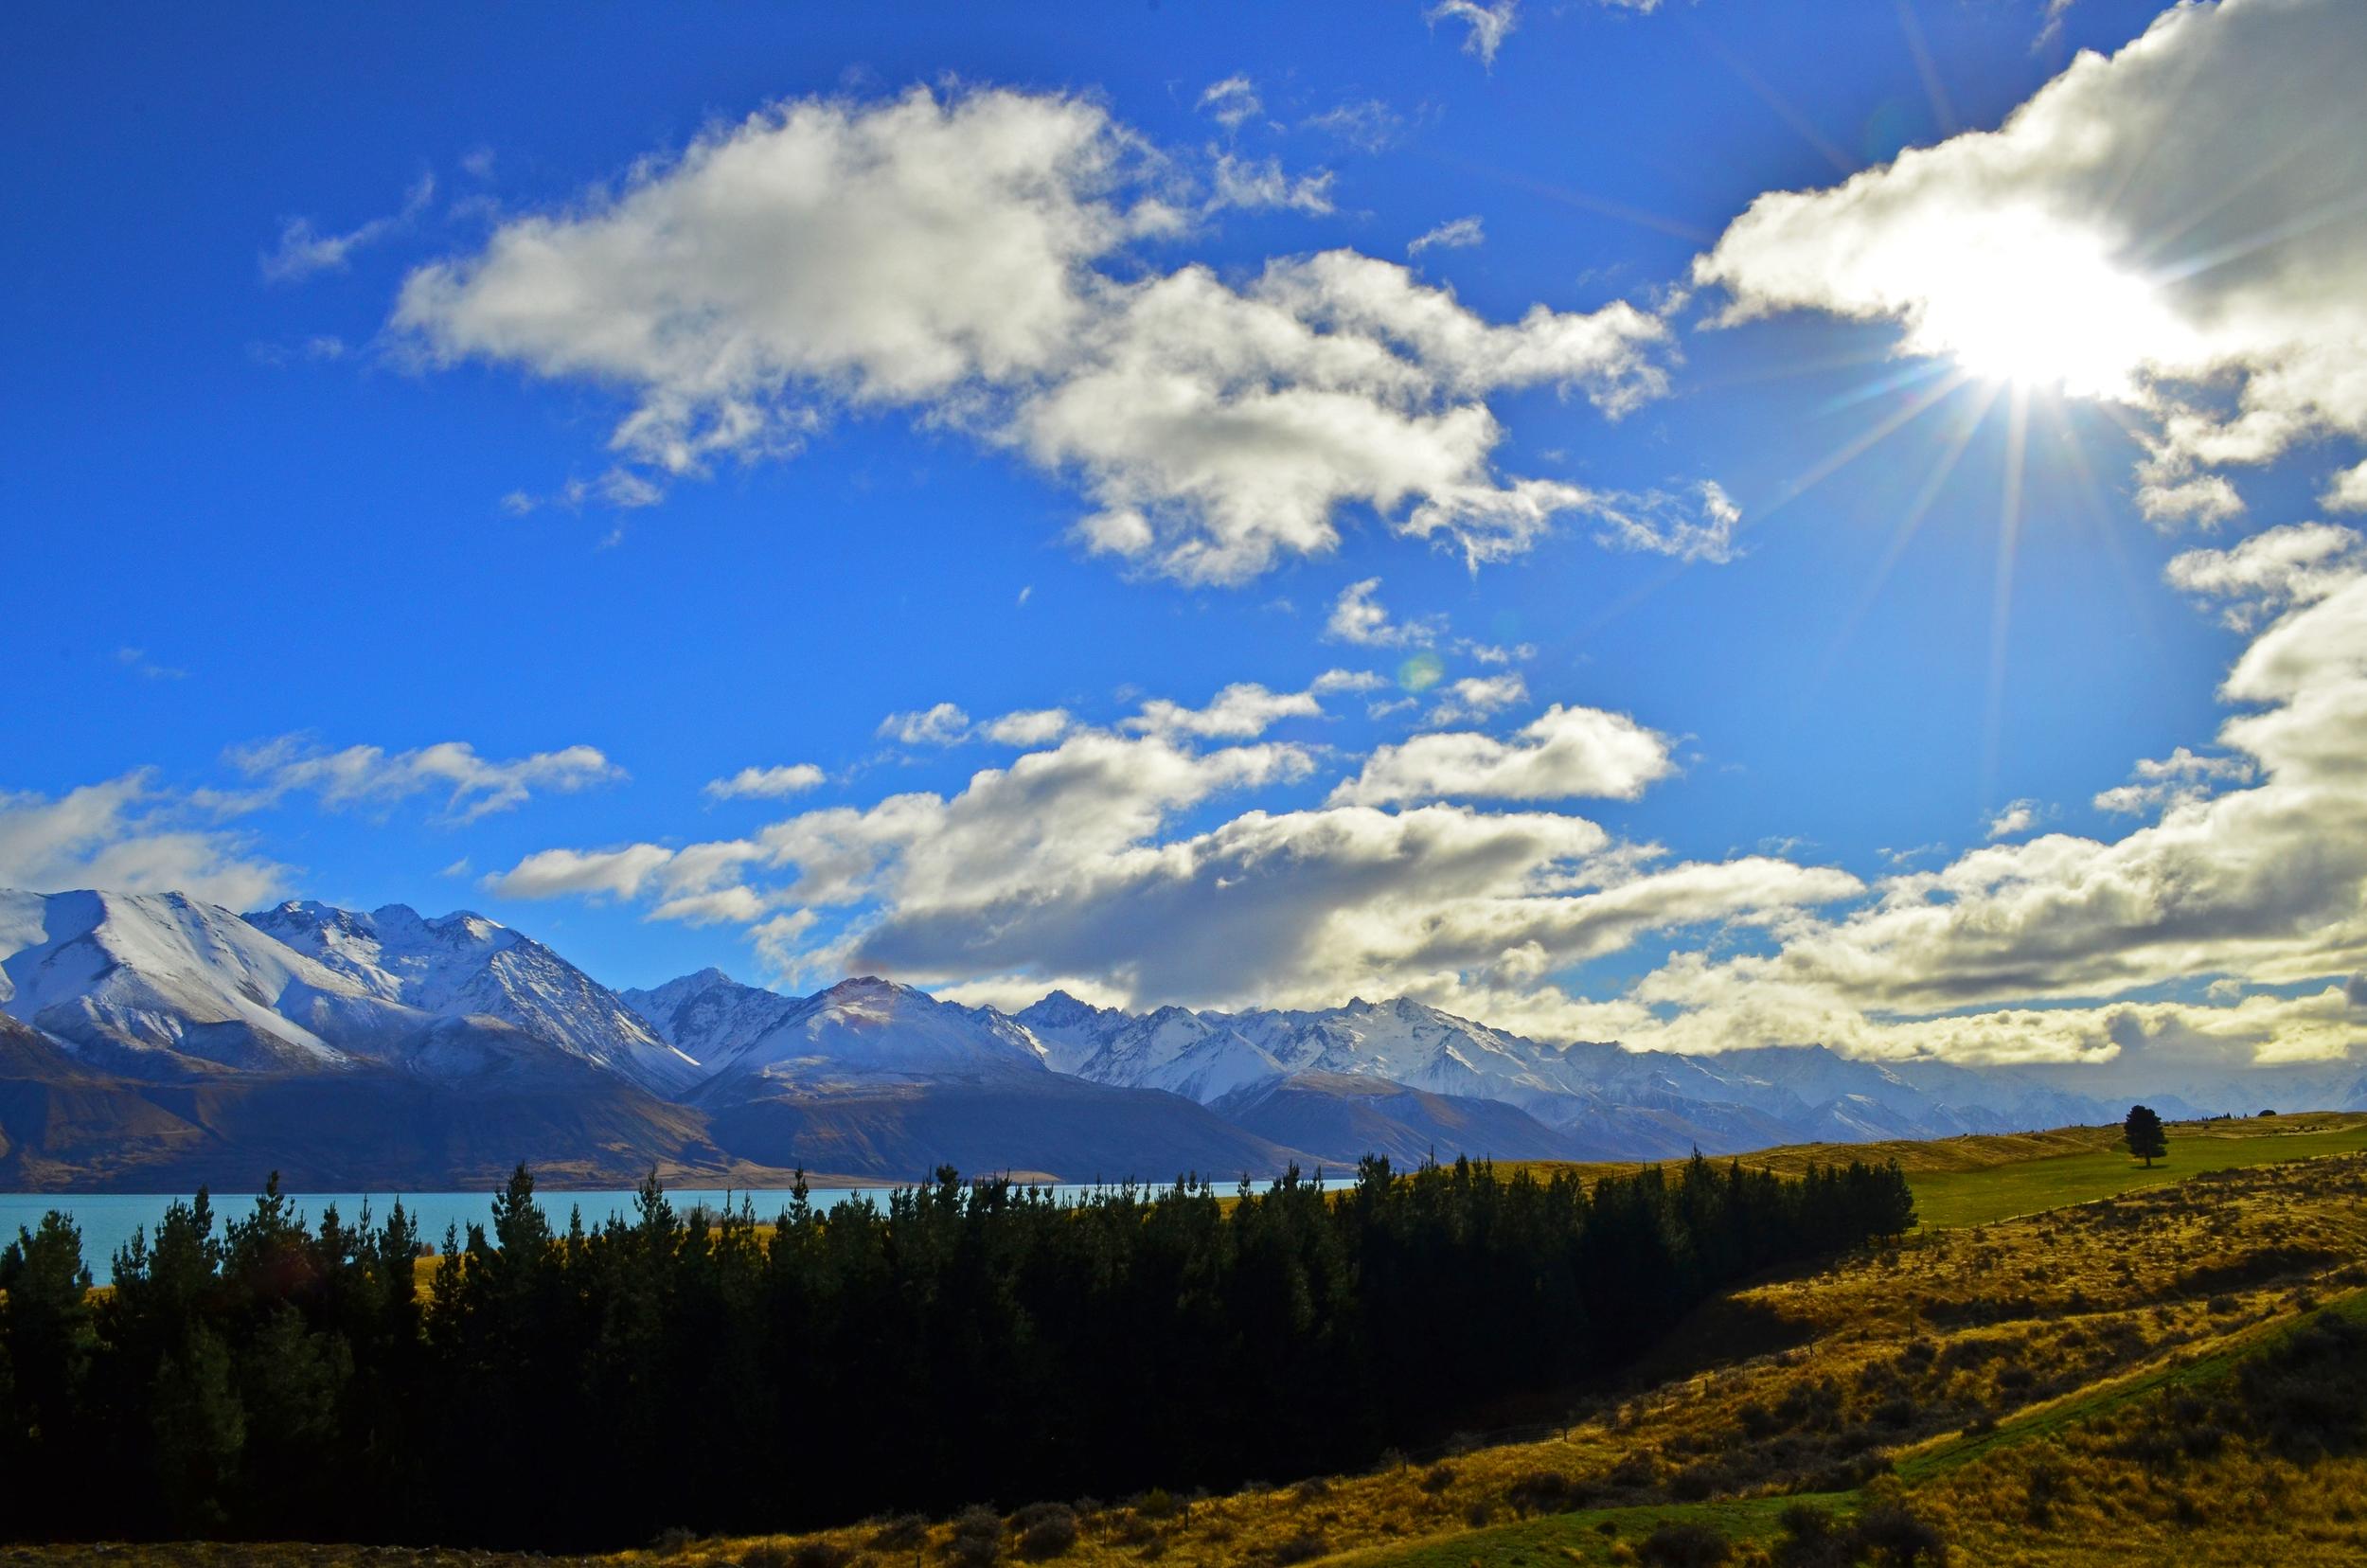 [6] The Views of Lake Pukaki.